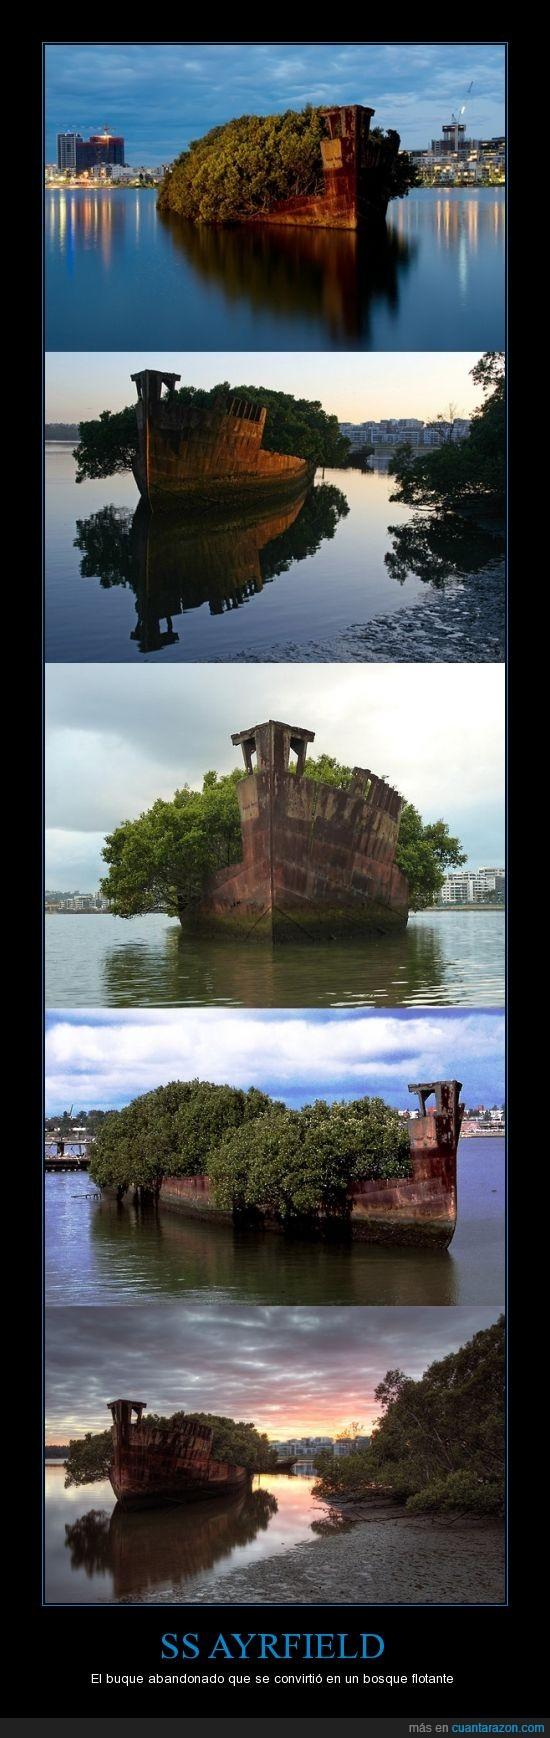 barco,bosque flotante,Homebush Bay,SS Ayrfield,Sydney